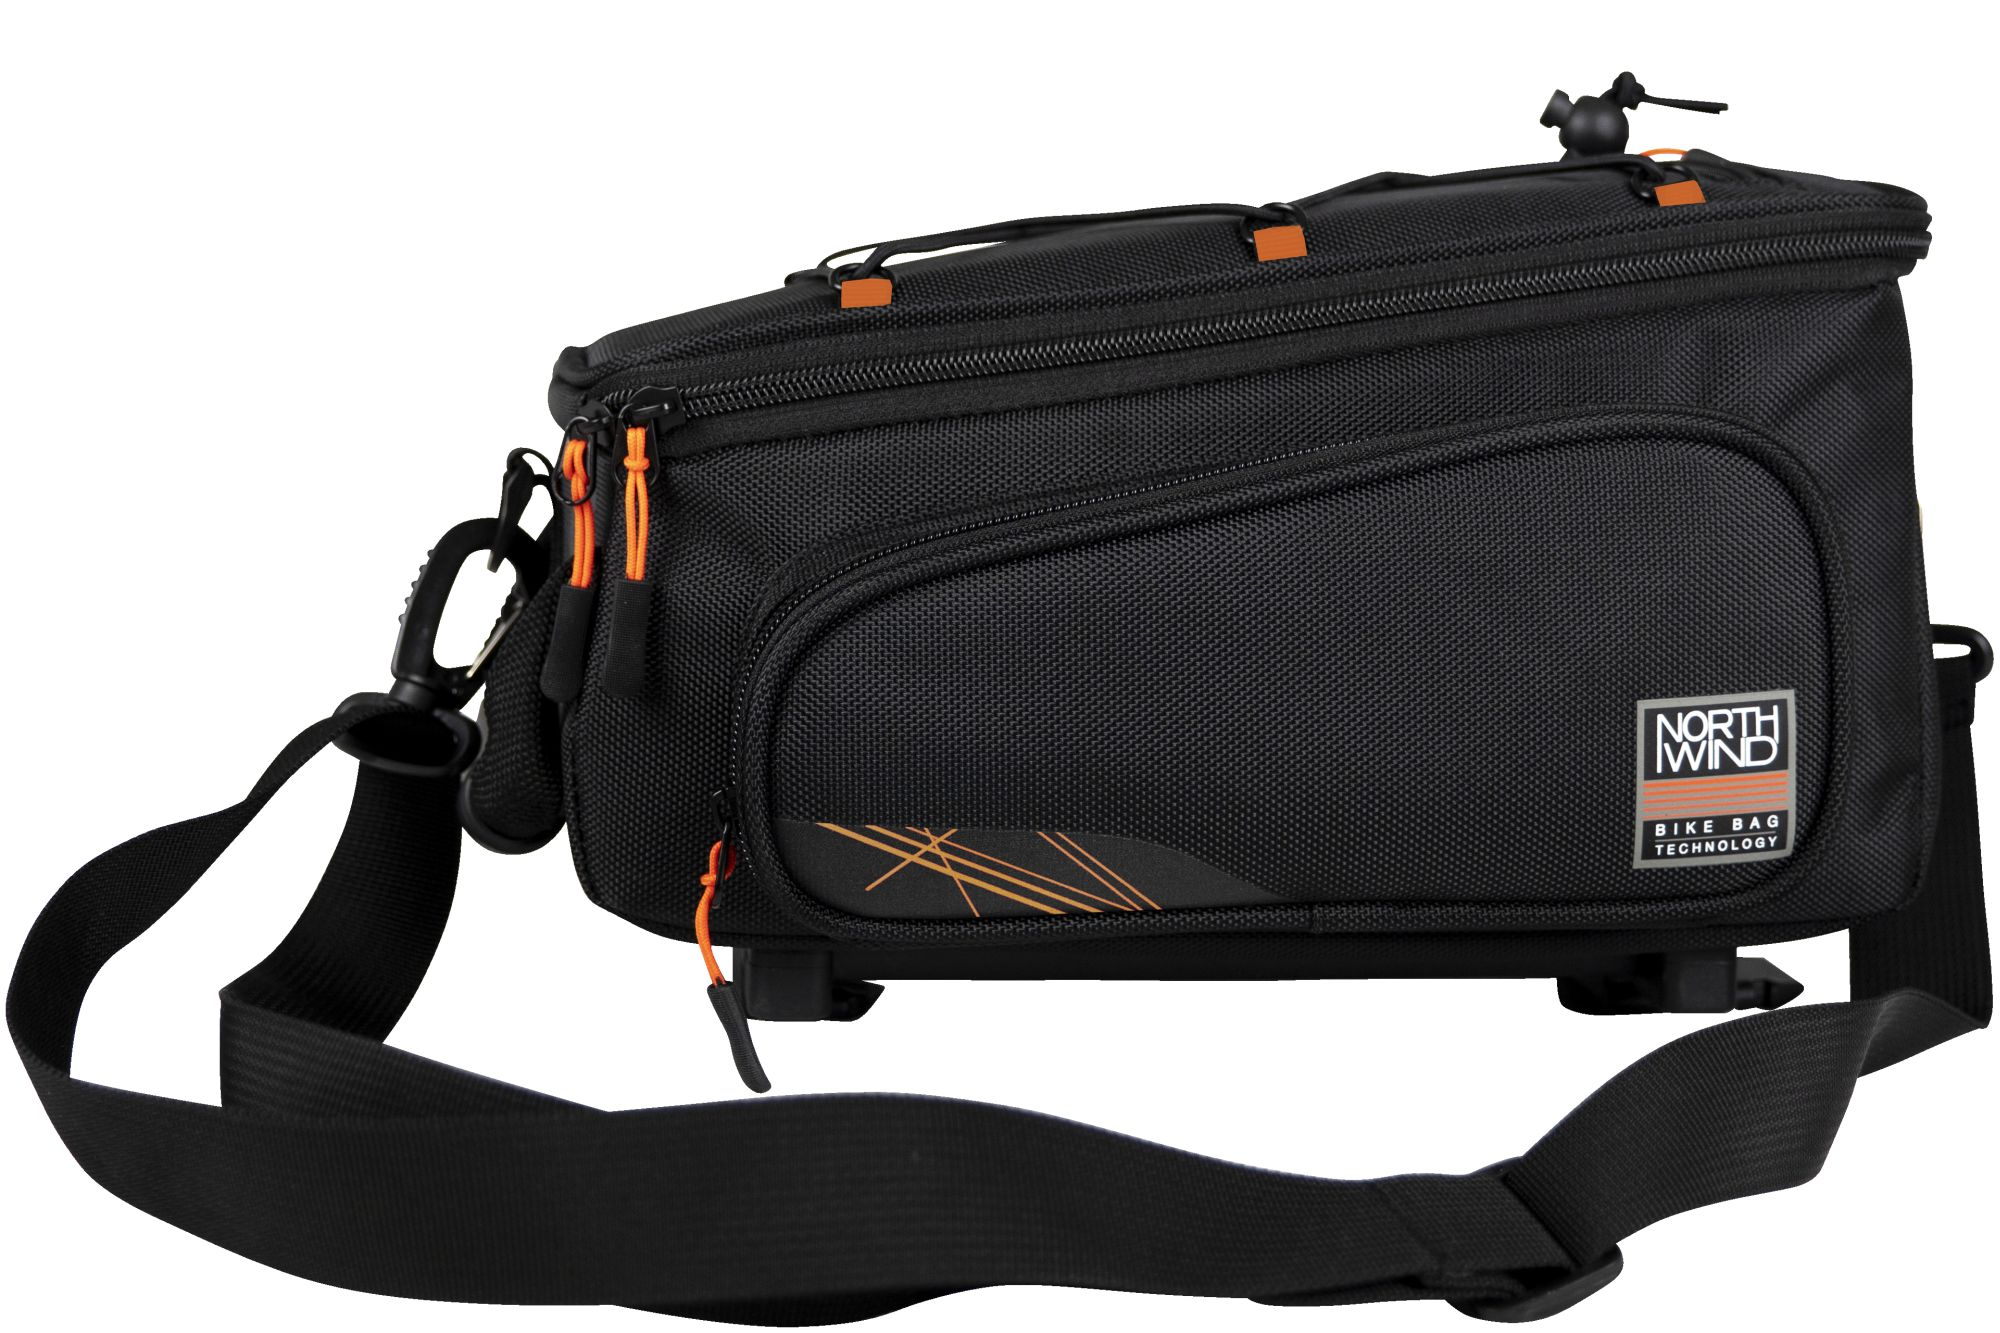 Fahrradteile/Koffer & Körbe: Northwind  Gepäckträgertasche Smartbag Classic i-Rack II ()